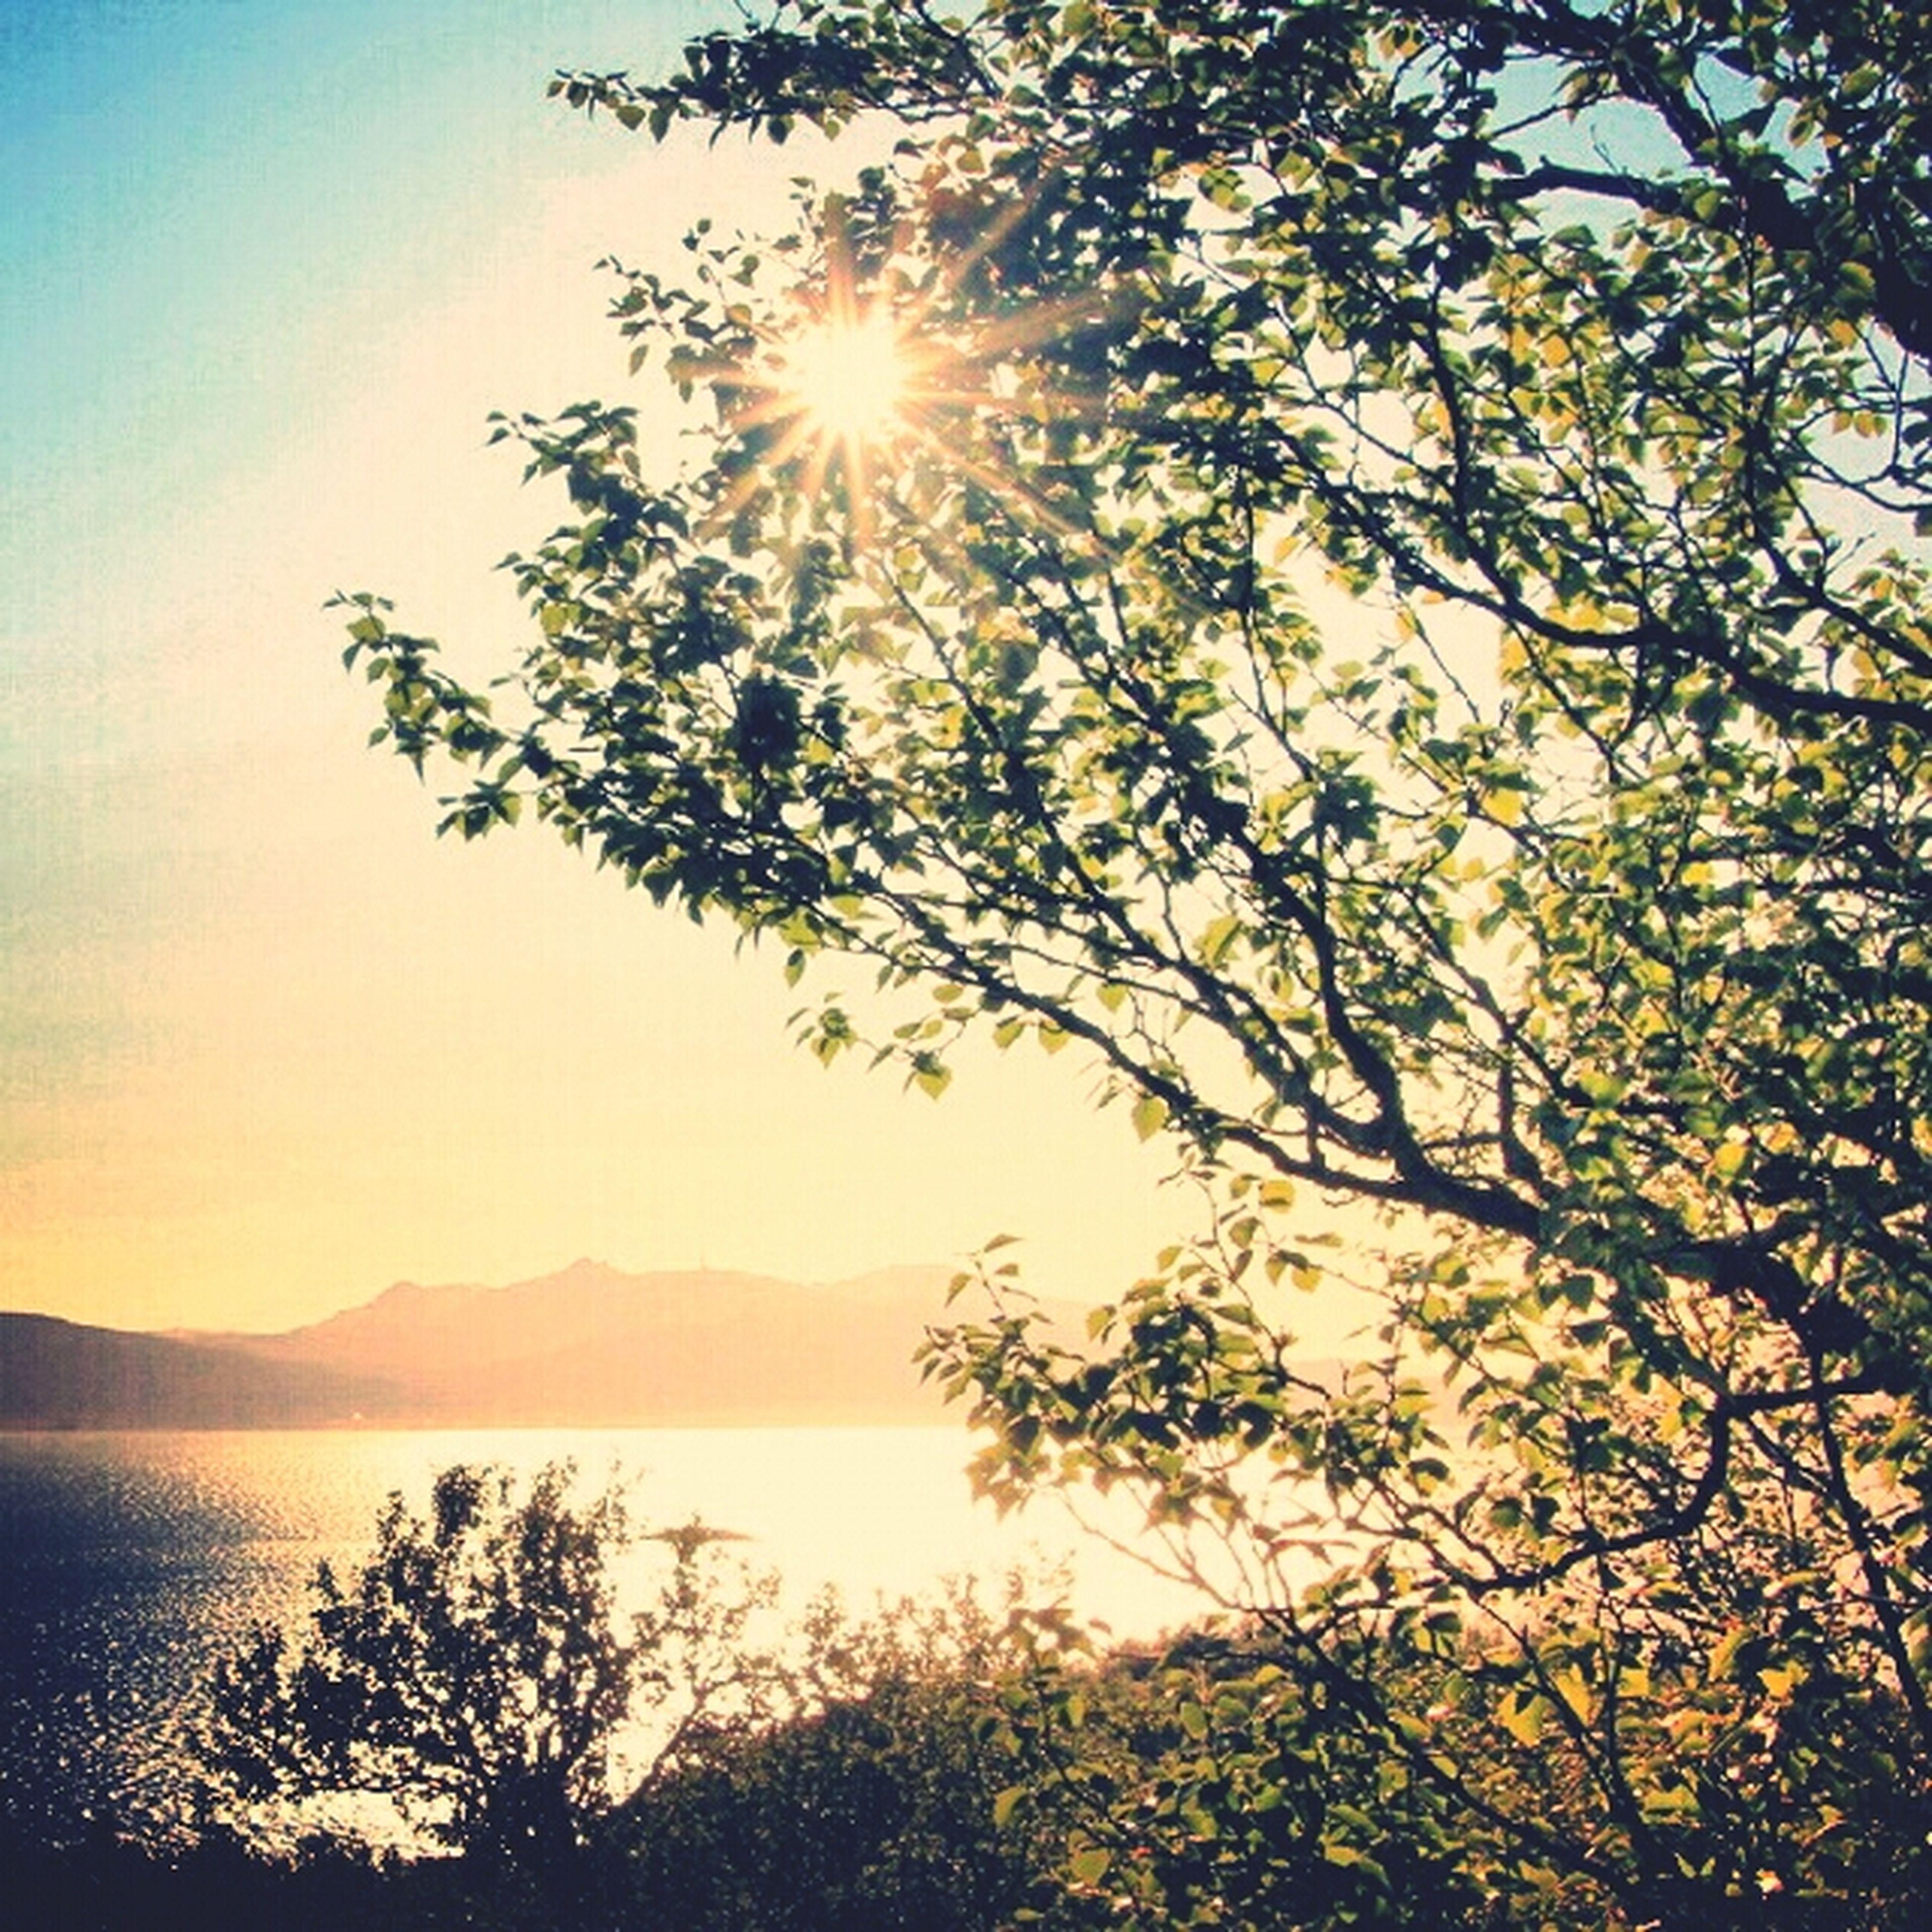 sun, tranquility, tranquil scene, water, tree, scenics, sunlight, beauty in nature, sunbeam, nature, lens flare, sky, mountain, sunset, lake, reflection, idyllic, branch, growth, sea